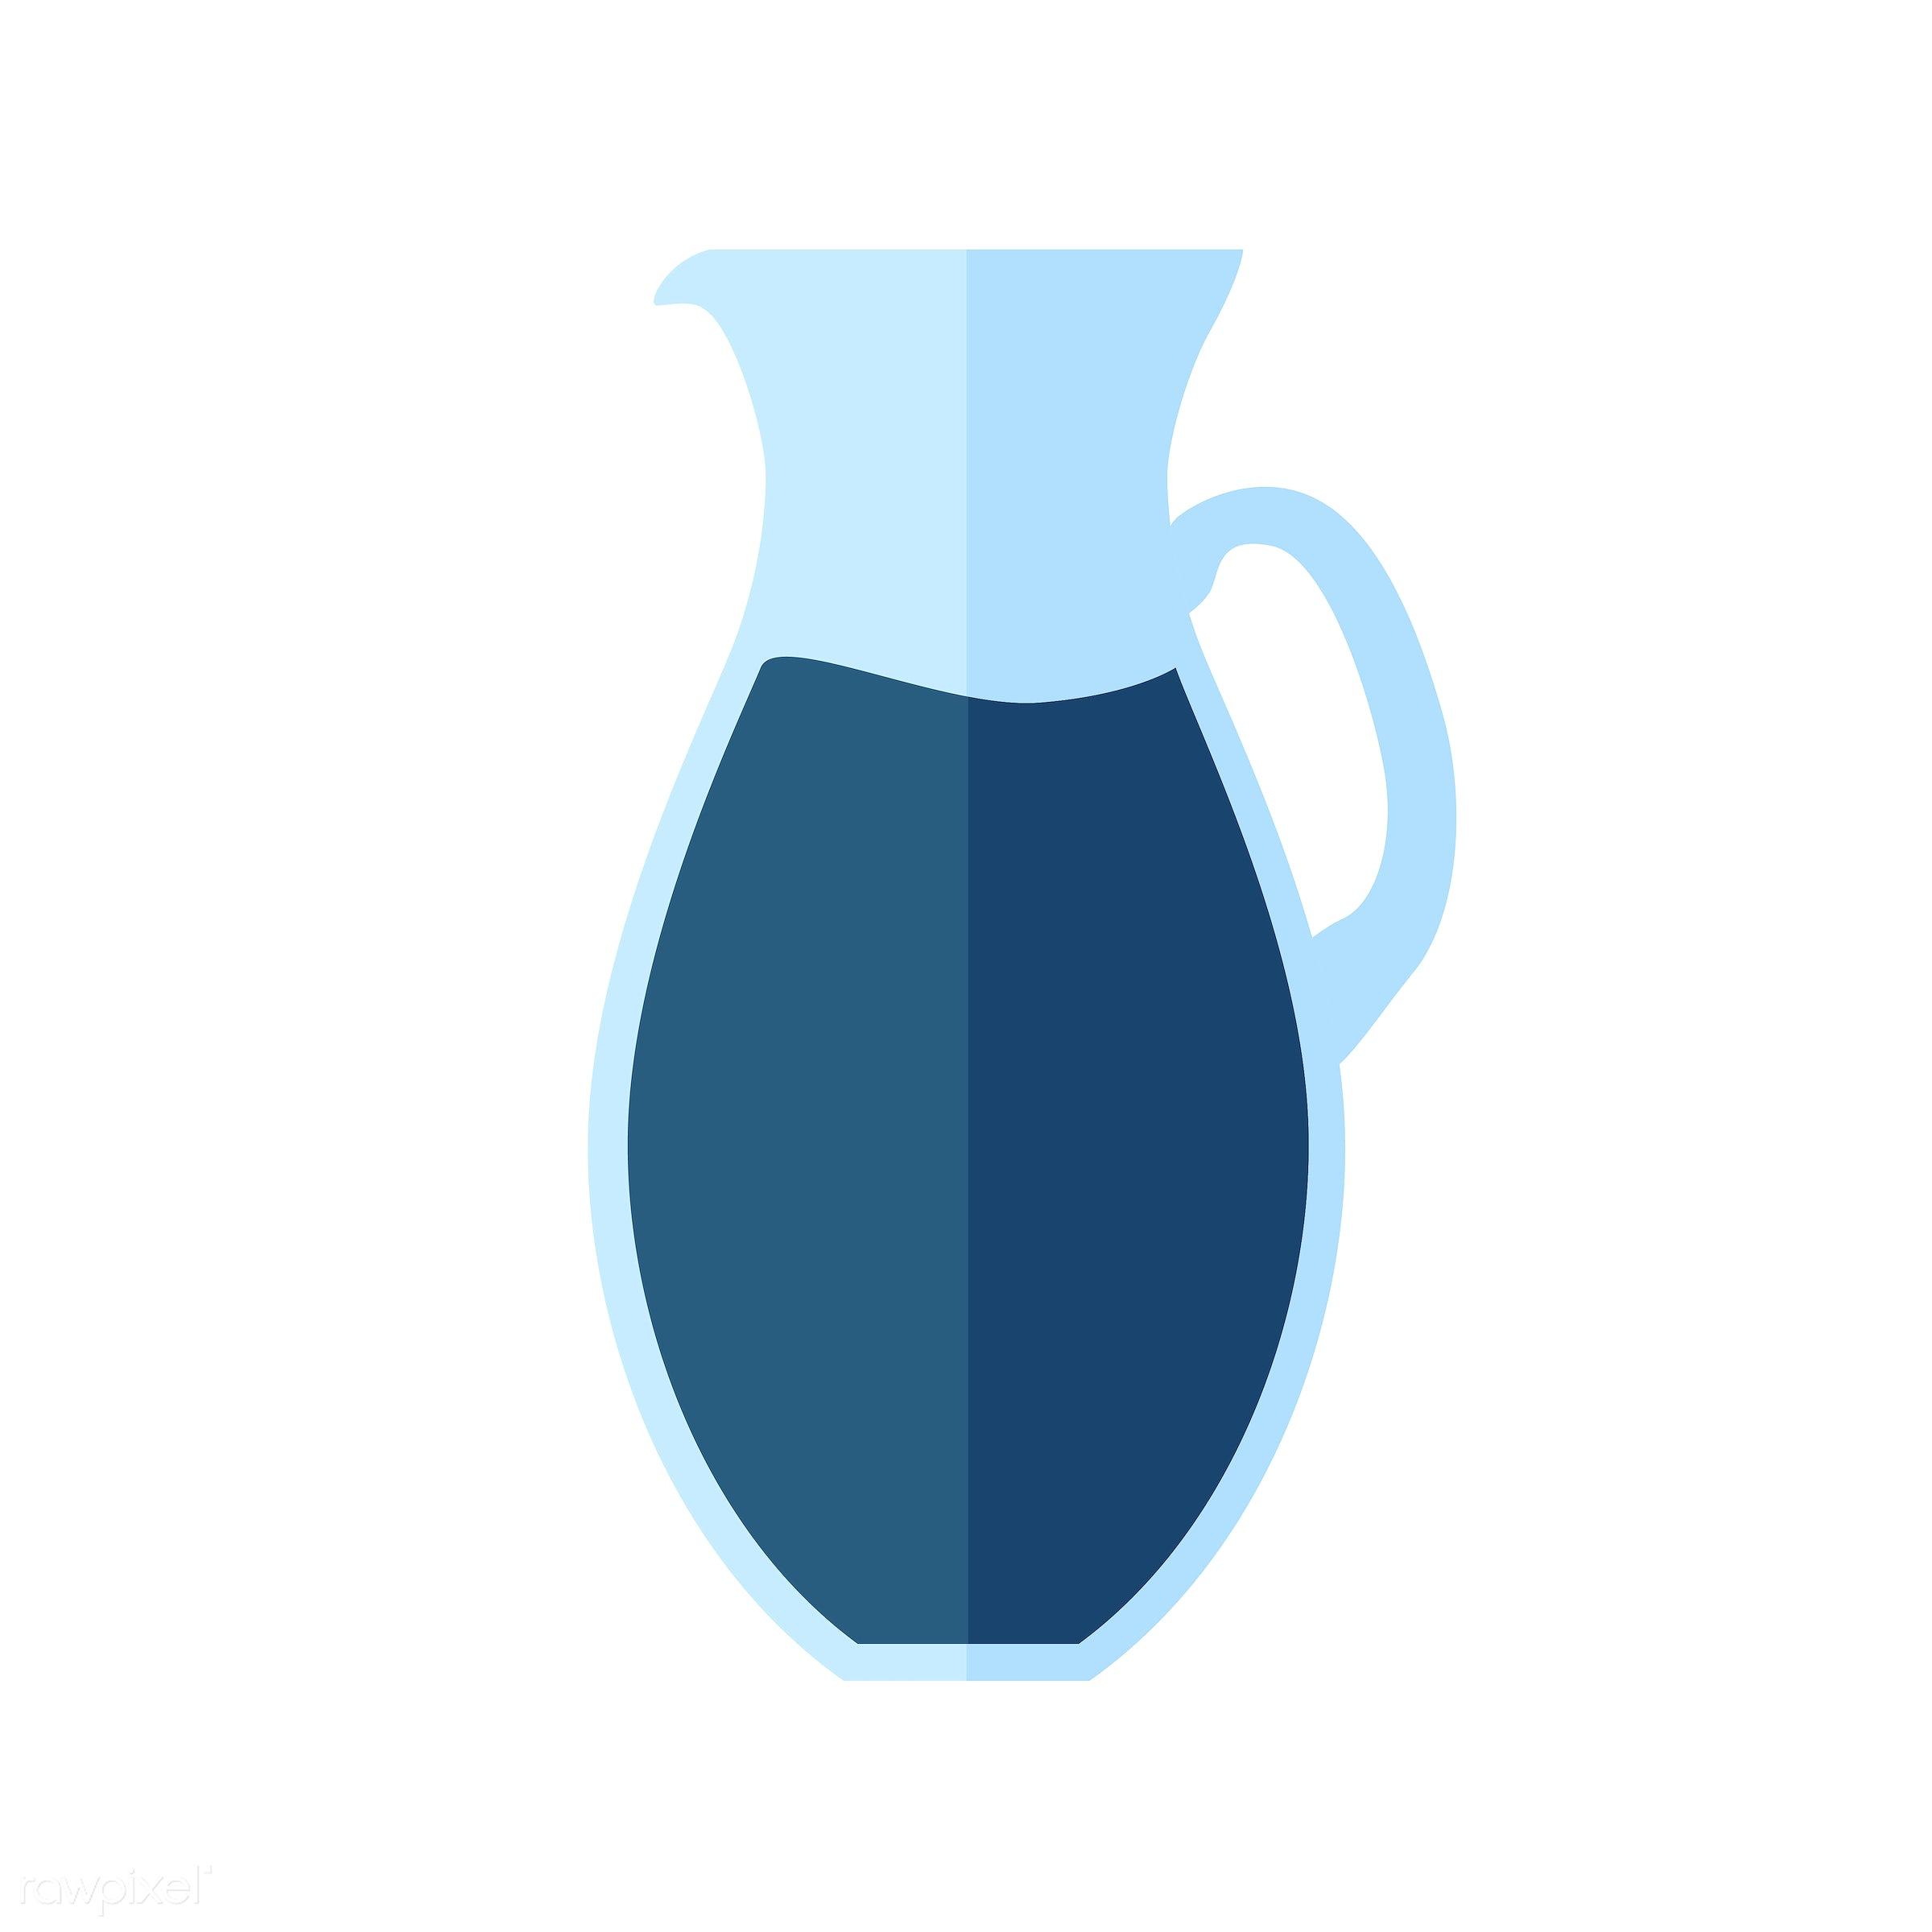 vector, graphic, illustration, icon, symbol, colorful, cute, drink, beverage, water, blue, lemonade, juice, jug